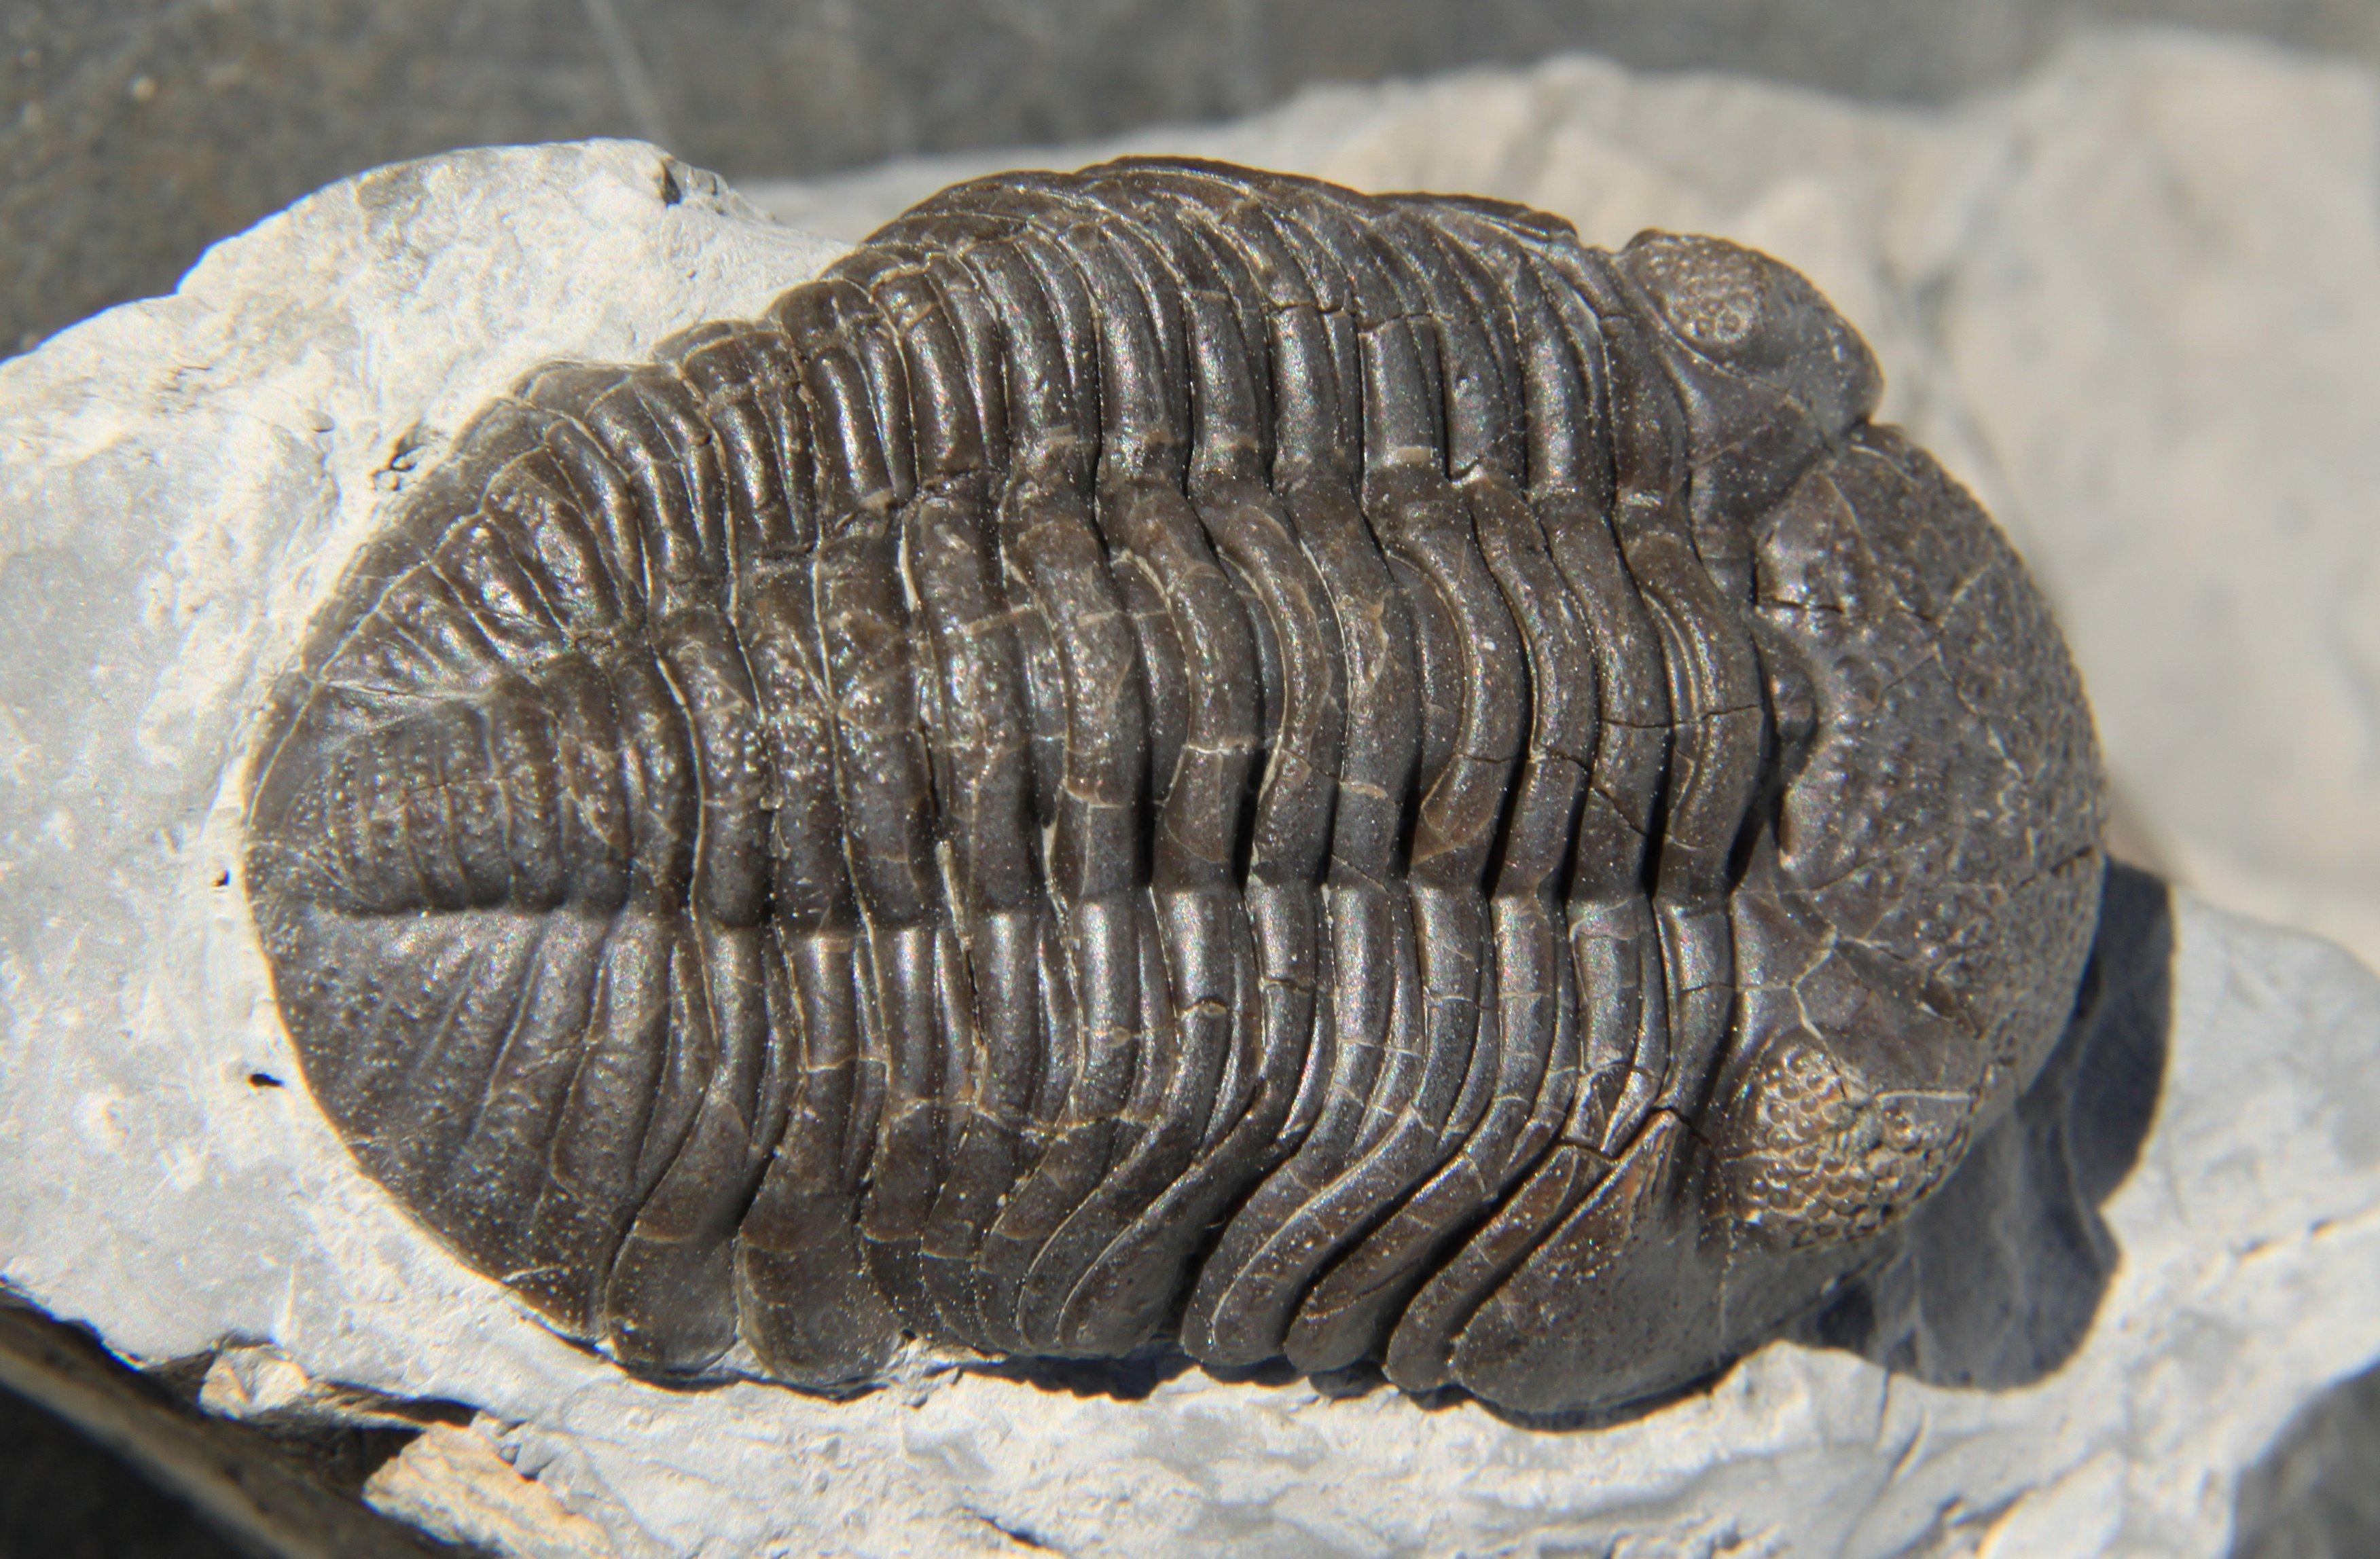 Depiction of Trilobita